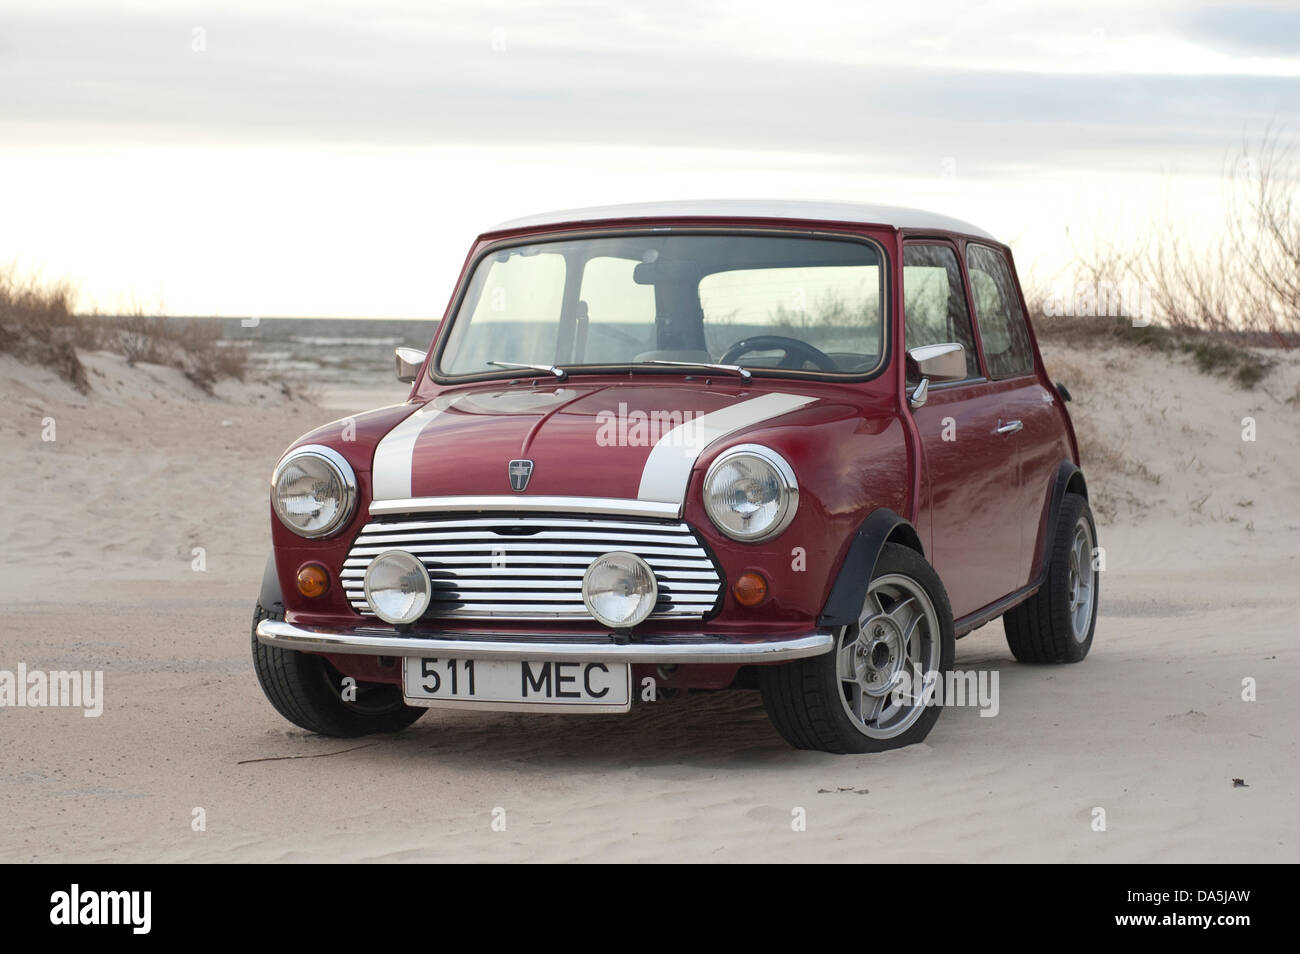 A classic Mini on a beach. - Stock Image